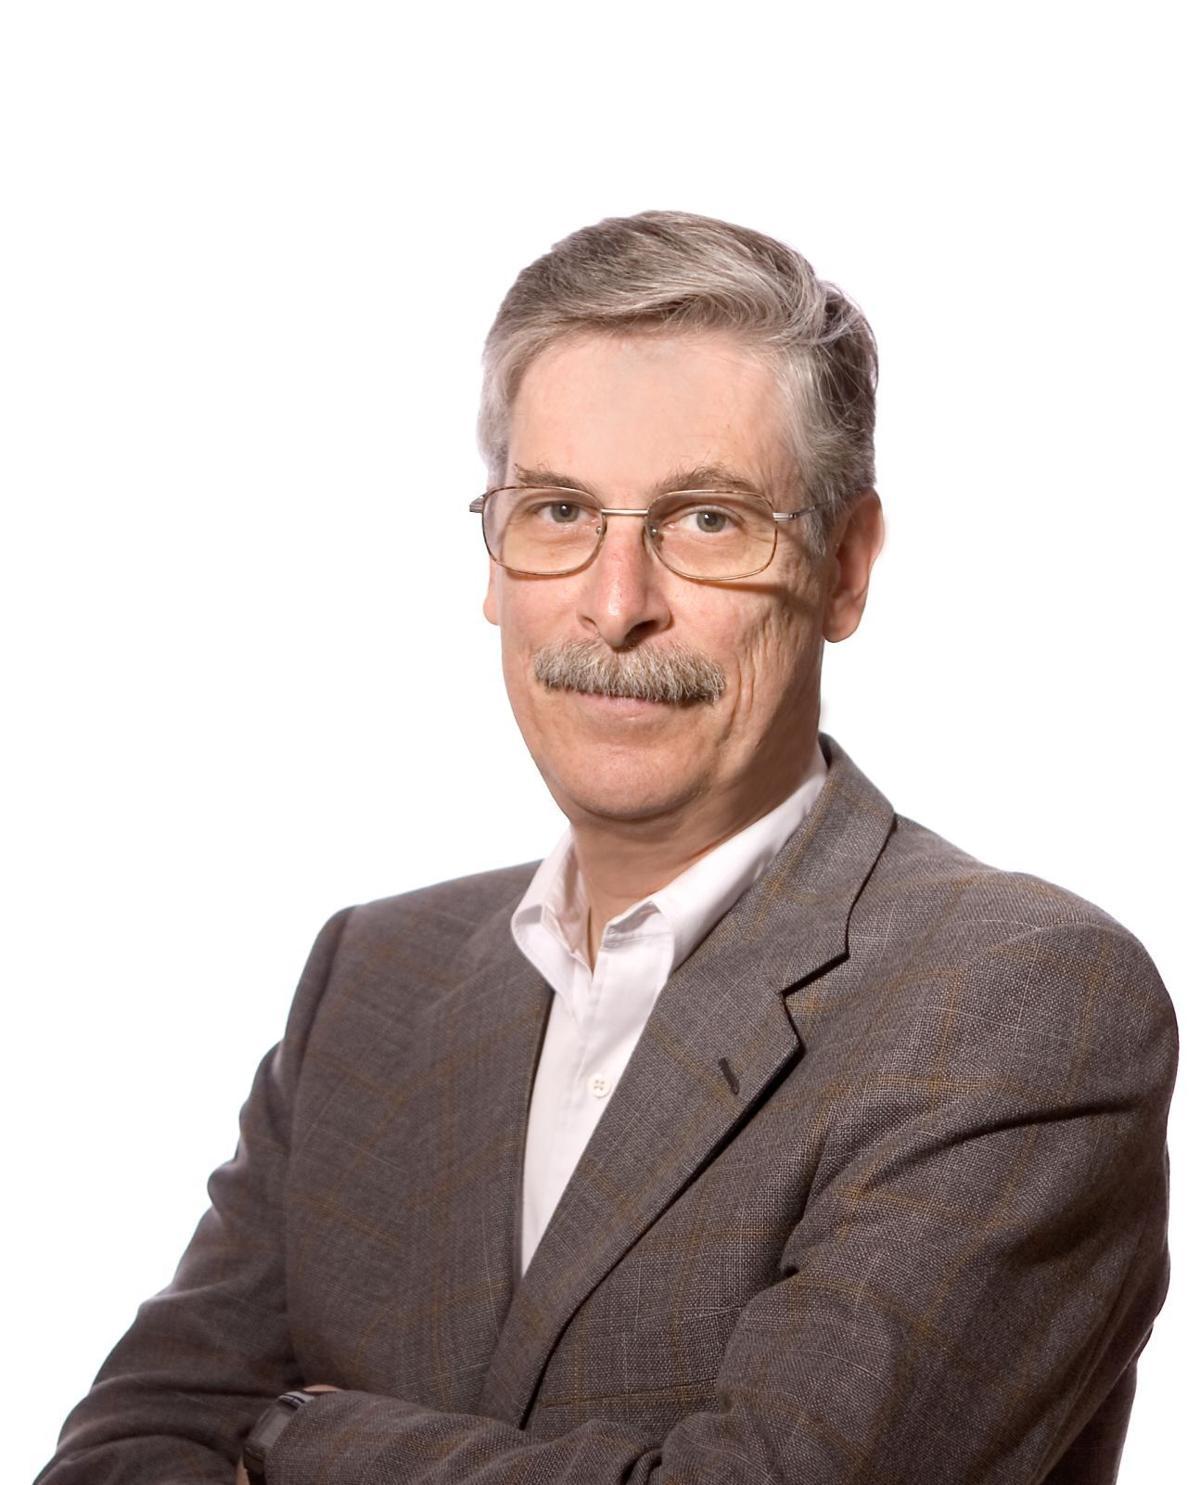 Michael Bean